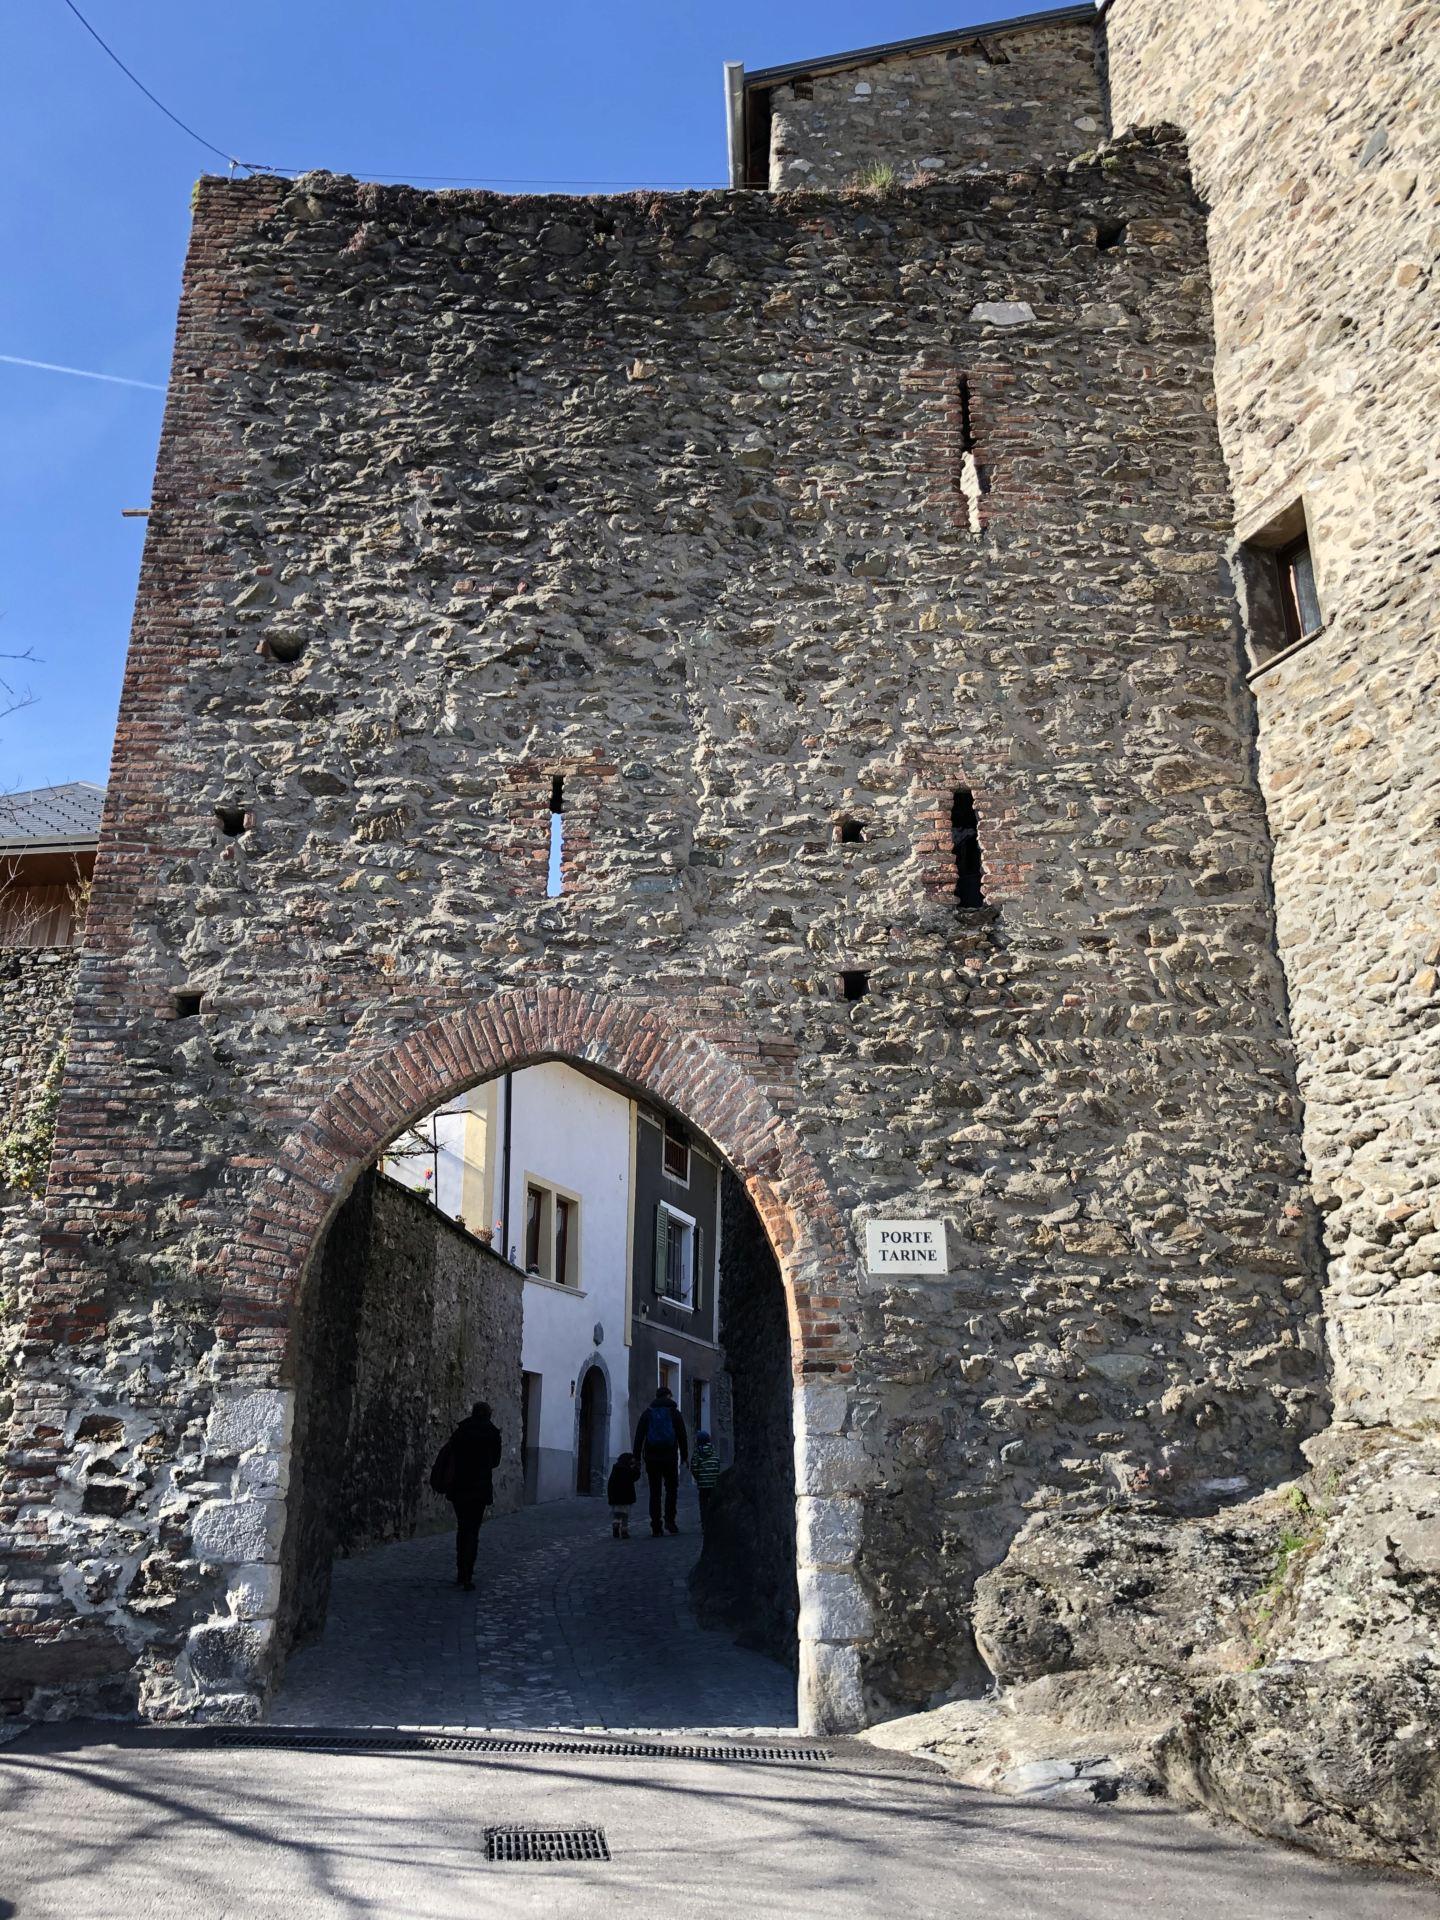 Petites balades en Rhône-Alpes - Page 2 Confla10